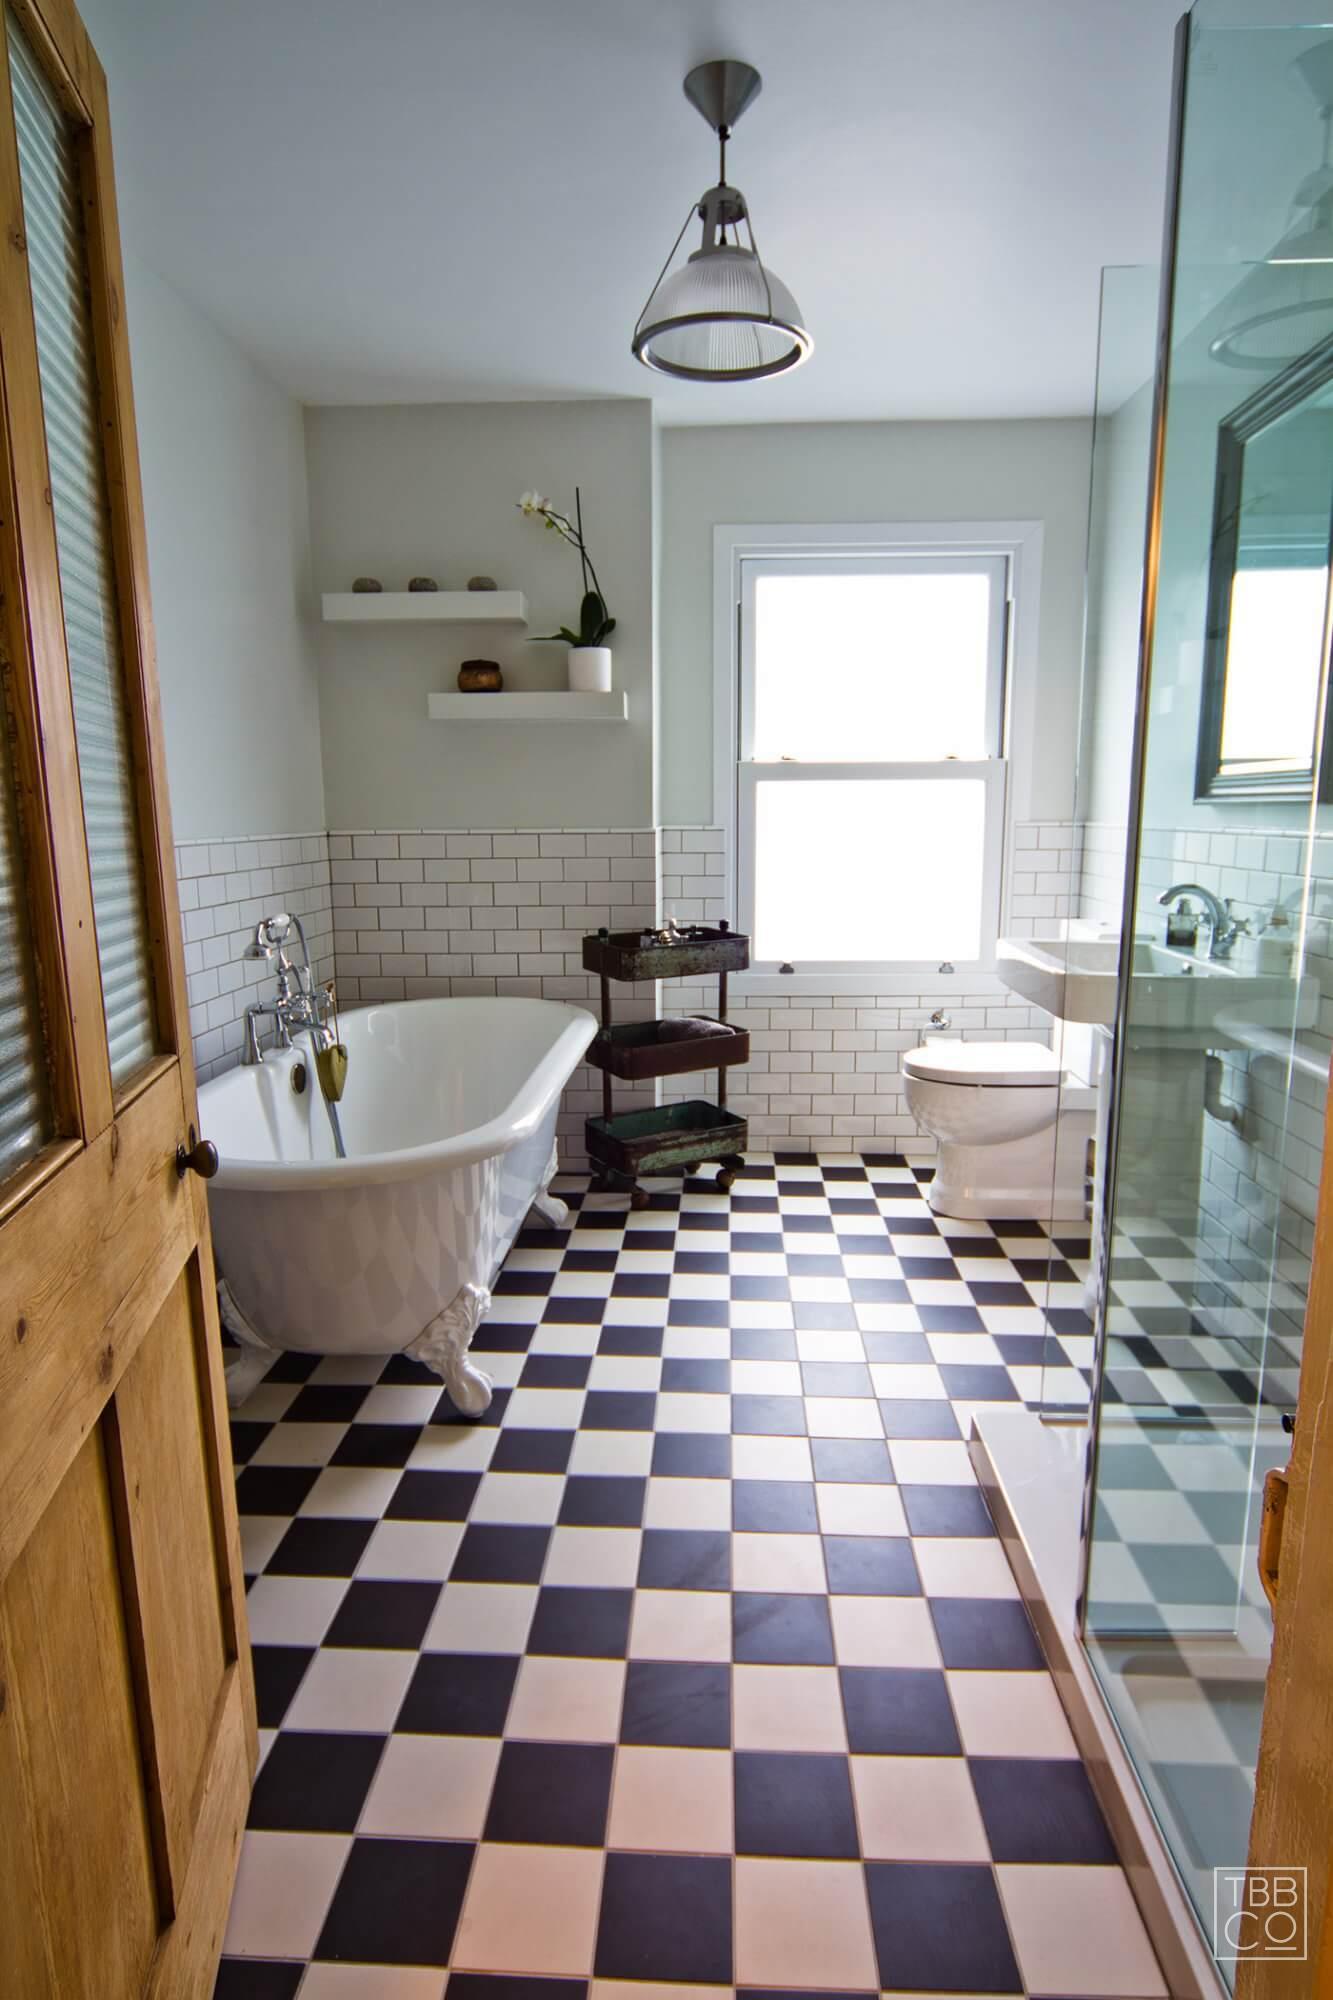 Traditional, fresh, elegant bathroom —Mortimer Road | The ...